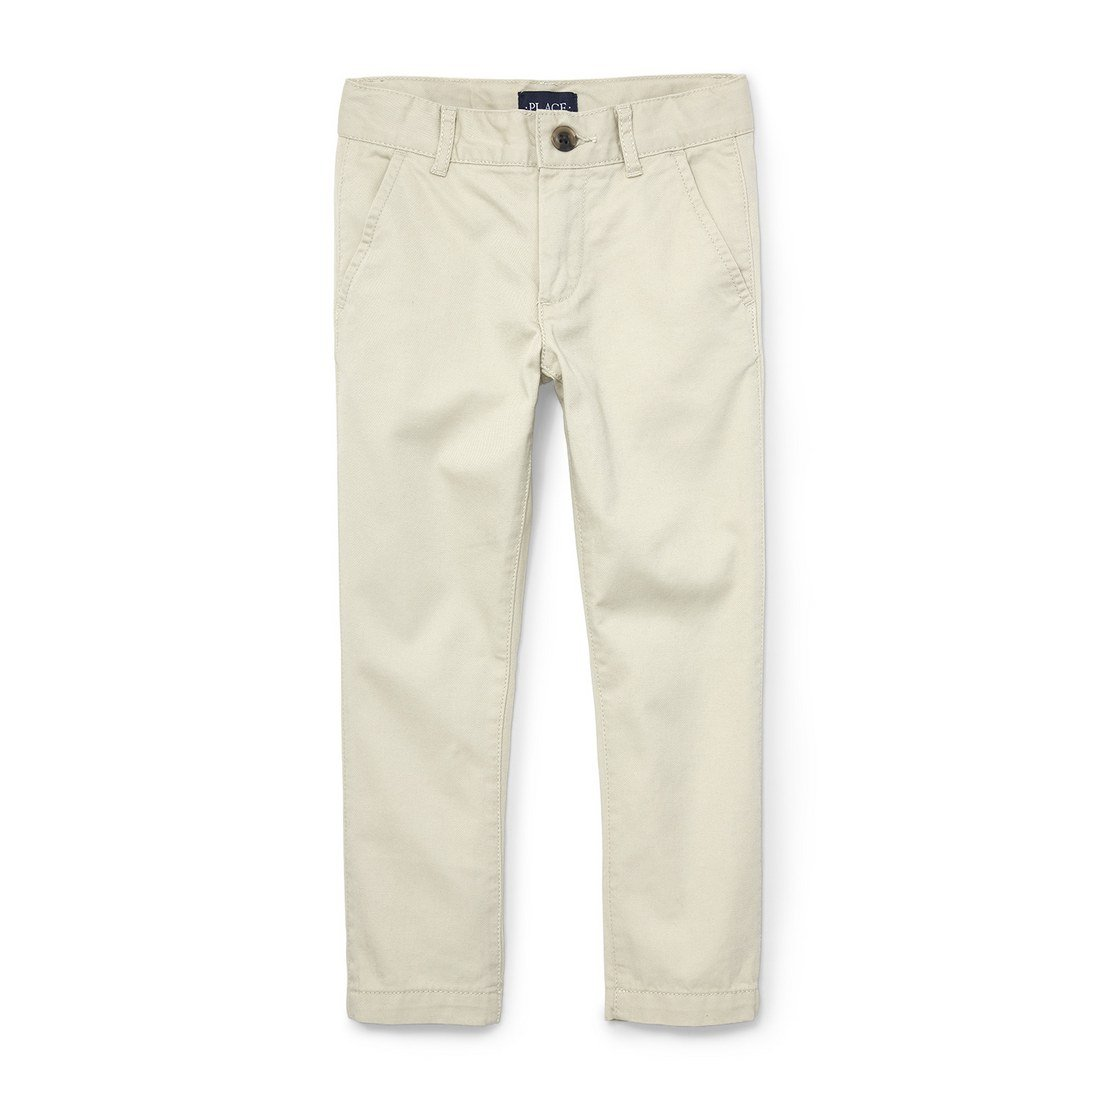 The Children's Place Big Boys' Skinny Uniform Chino Pants, Berber 4133, 6